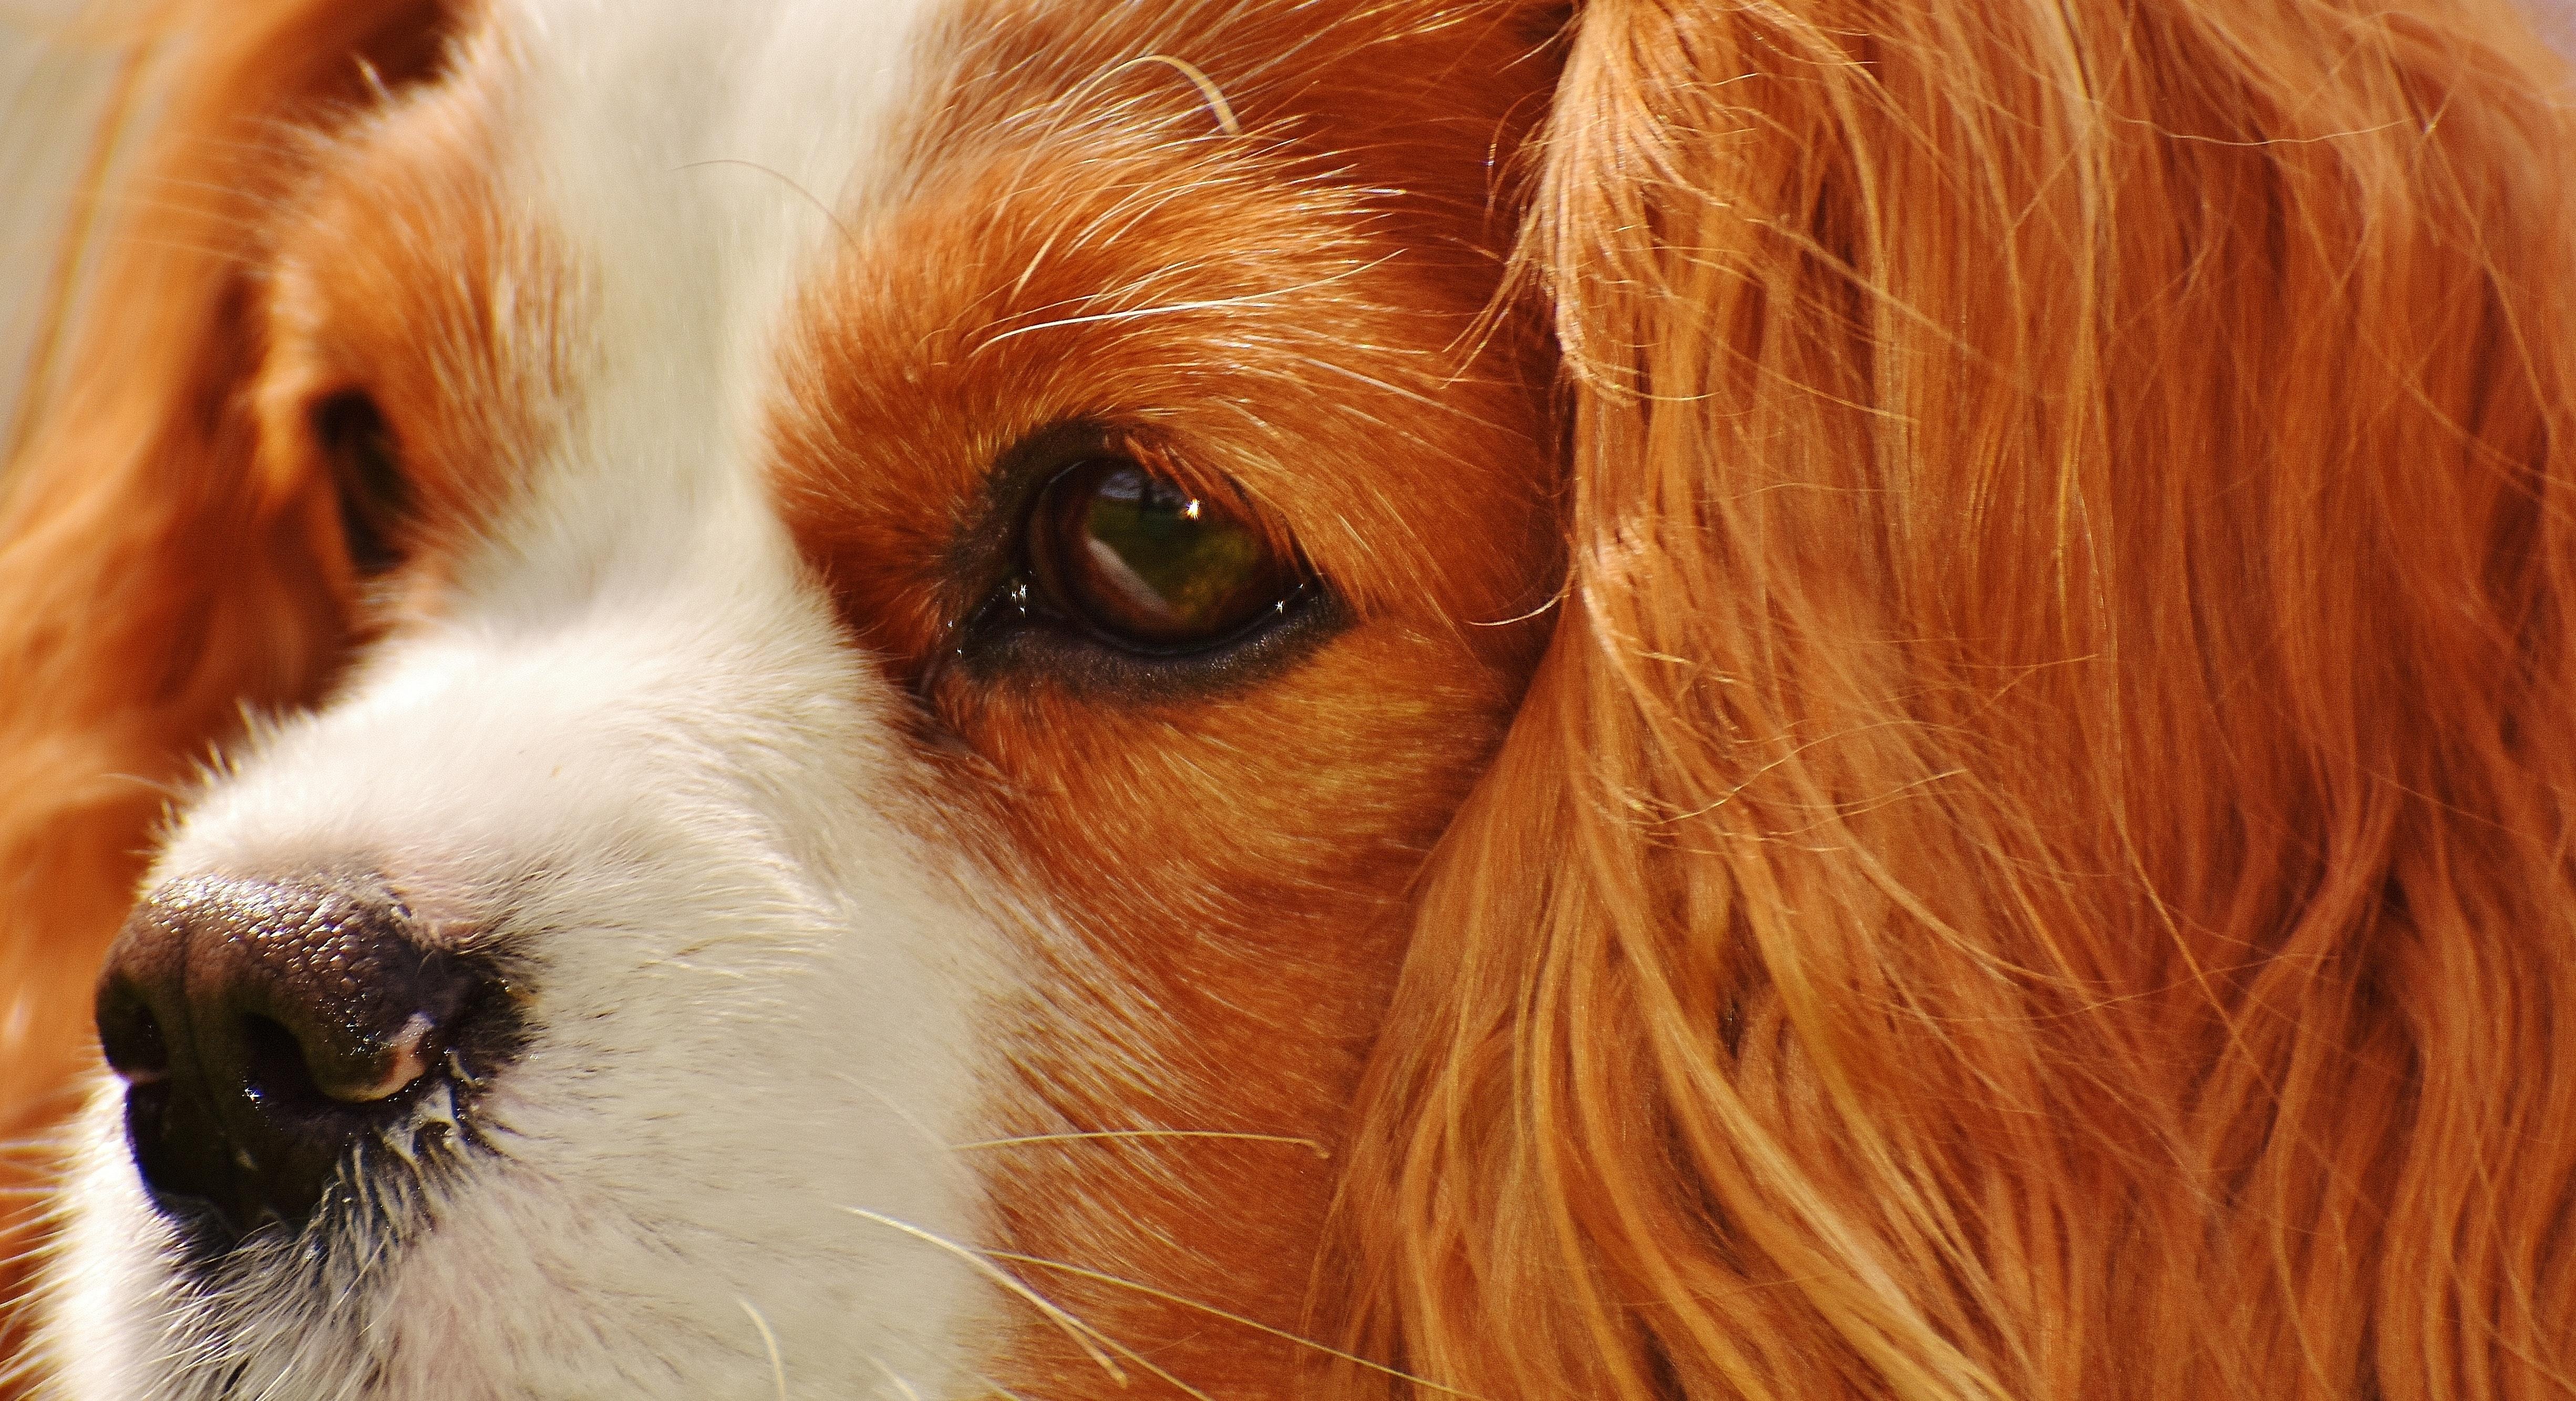 Wonderful Cavalier Canine Adorable Dog - pexels-photo-209057  You Should Have_562350  .jpg\u0026fm\u003djpg